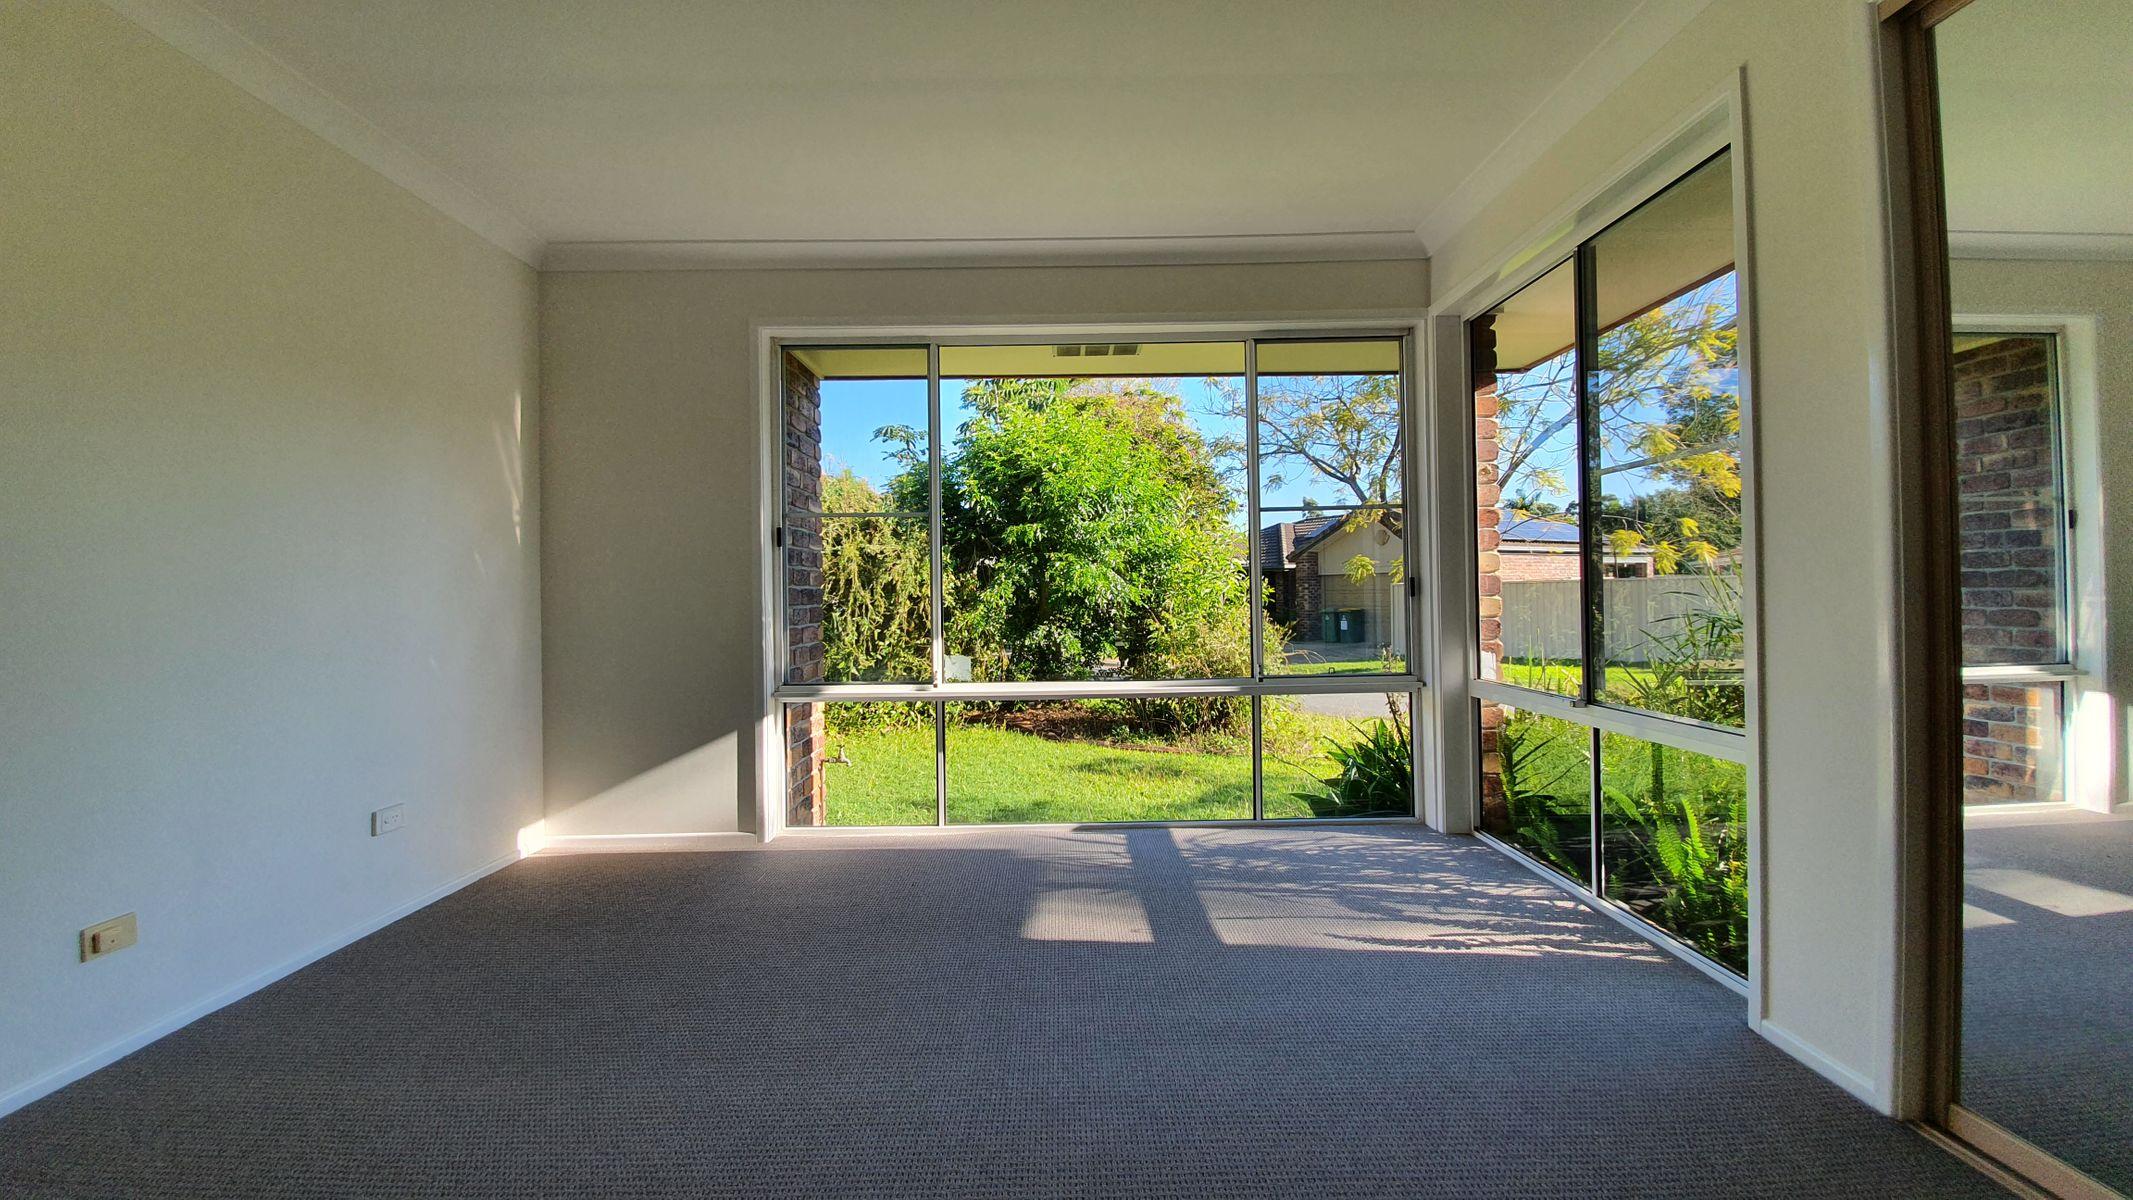 15 Seamist Drive, Nerang, QLD 4211